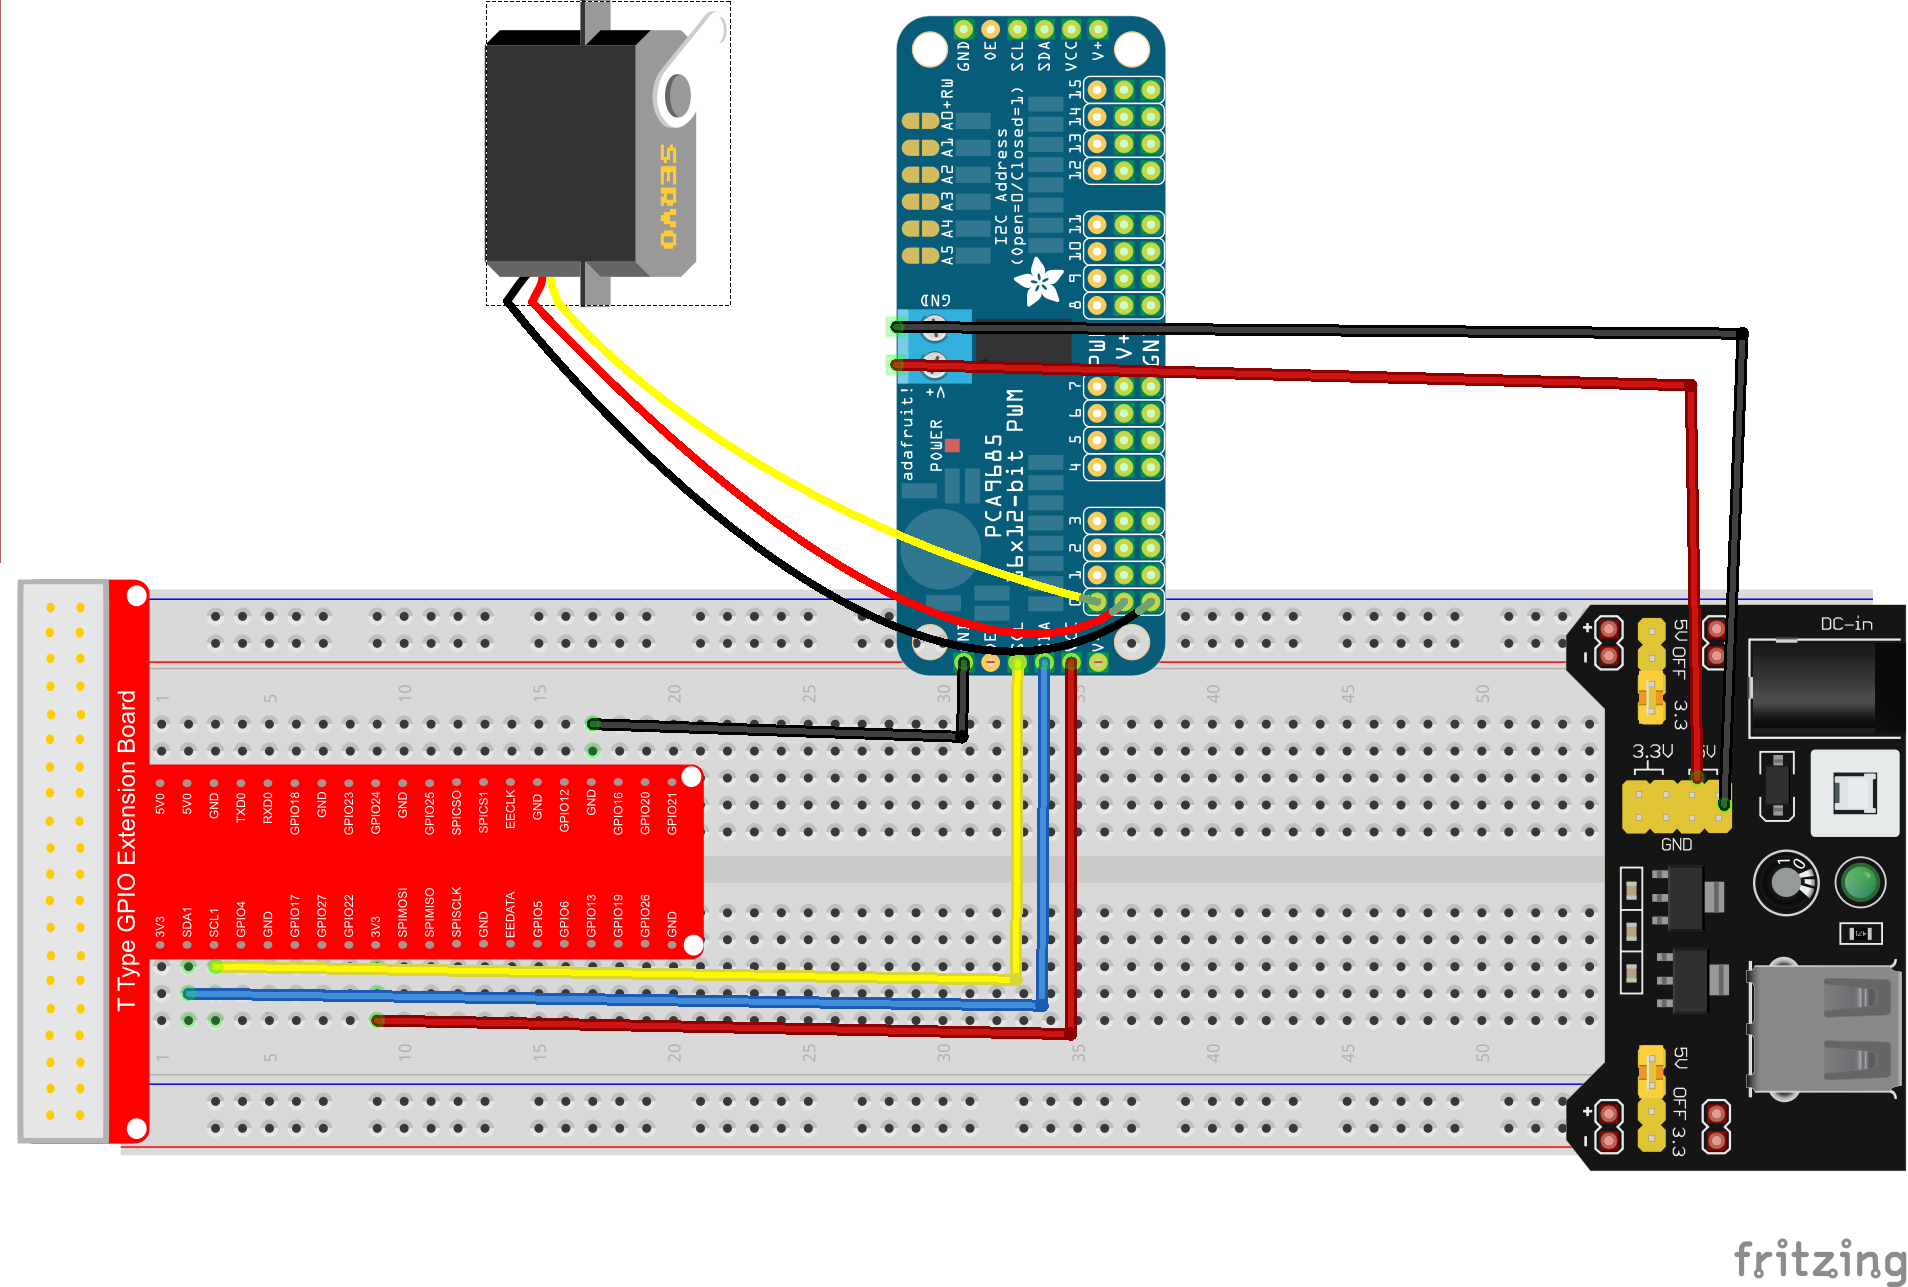 Marvelous Raspberry Pi Starter Kit Lesson 12 Raspberry Pi Drive Sg90 Servo Wiring 101 Capemaxxcnl